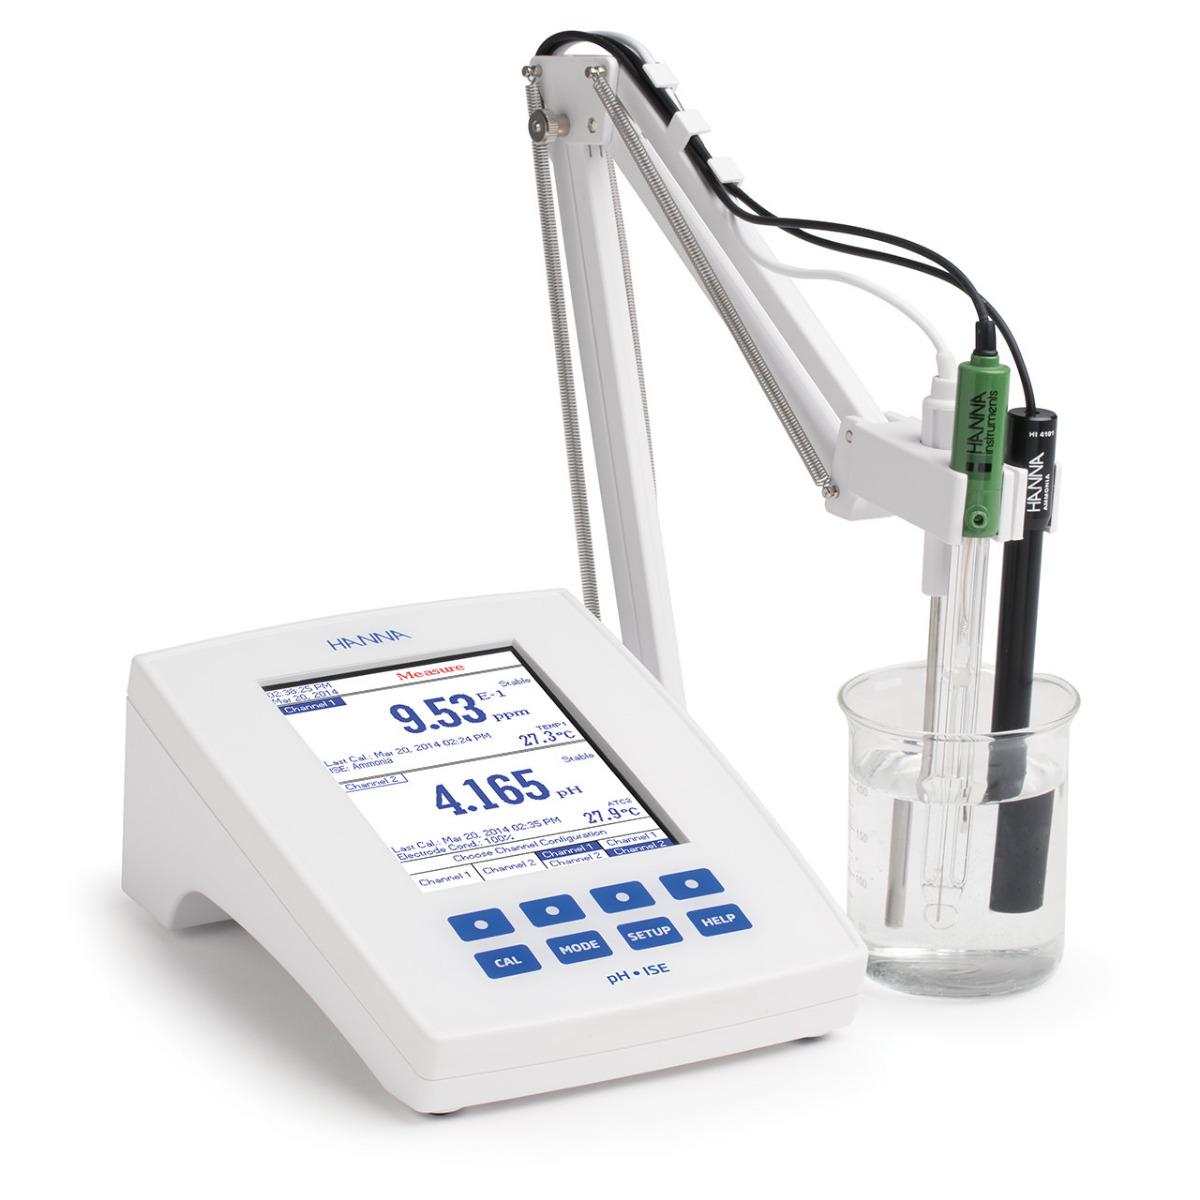 HI5222 dual channel pH/ISE benchtop meter